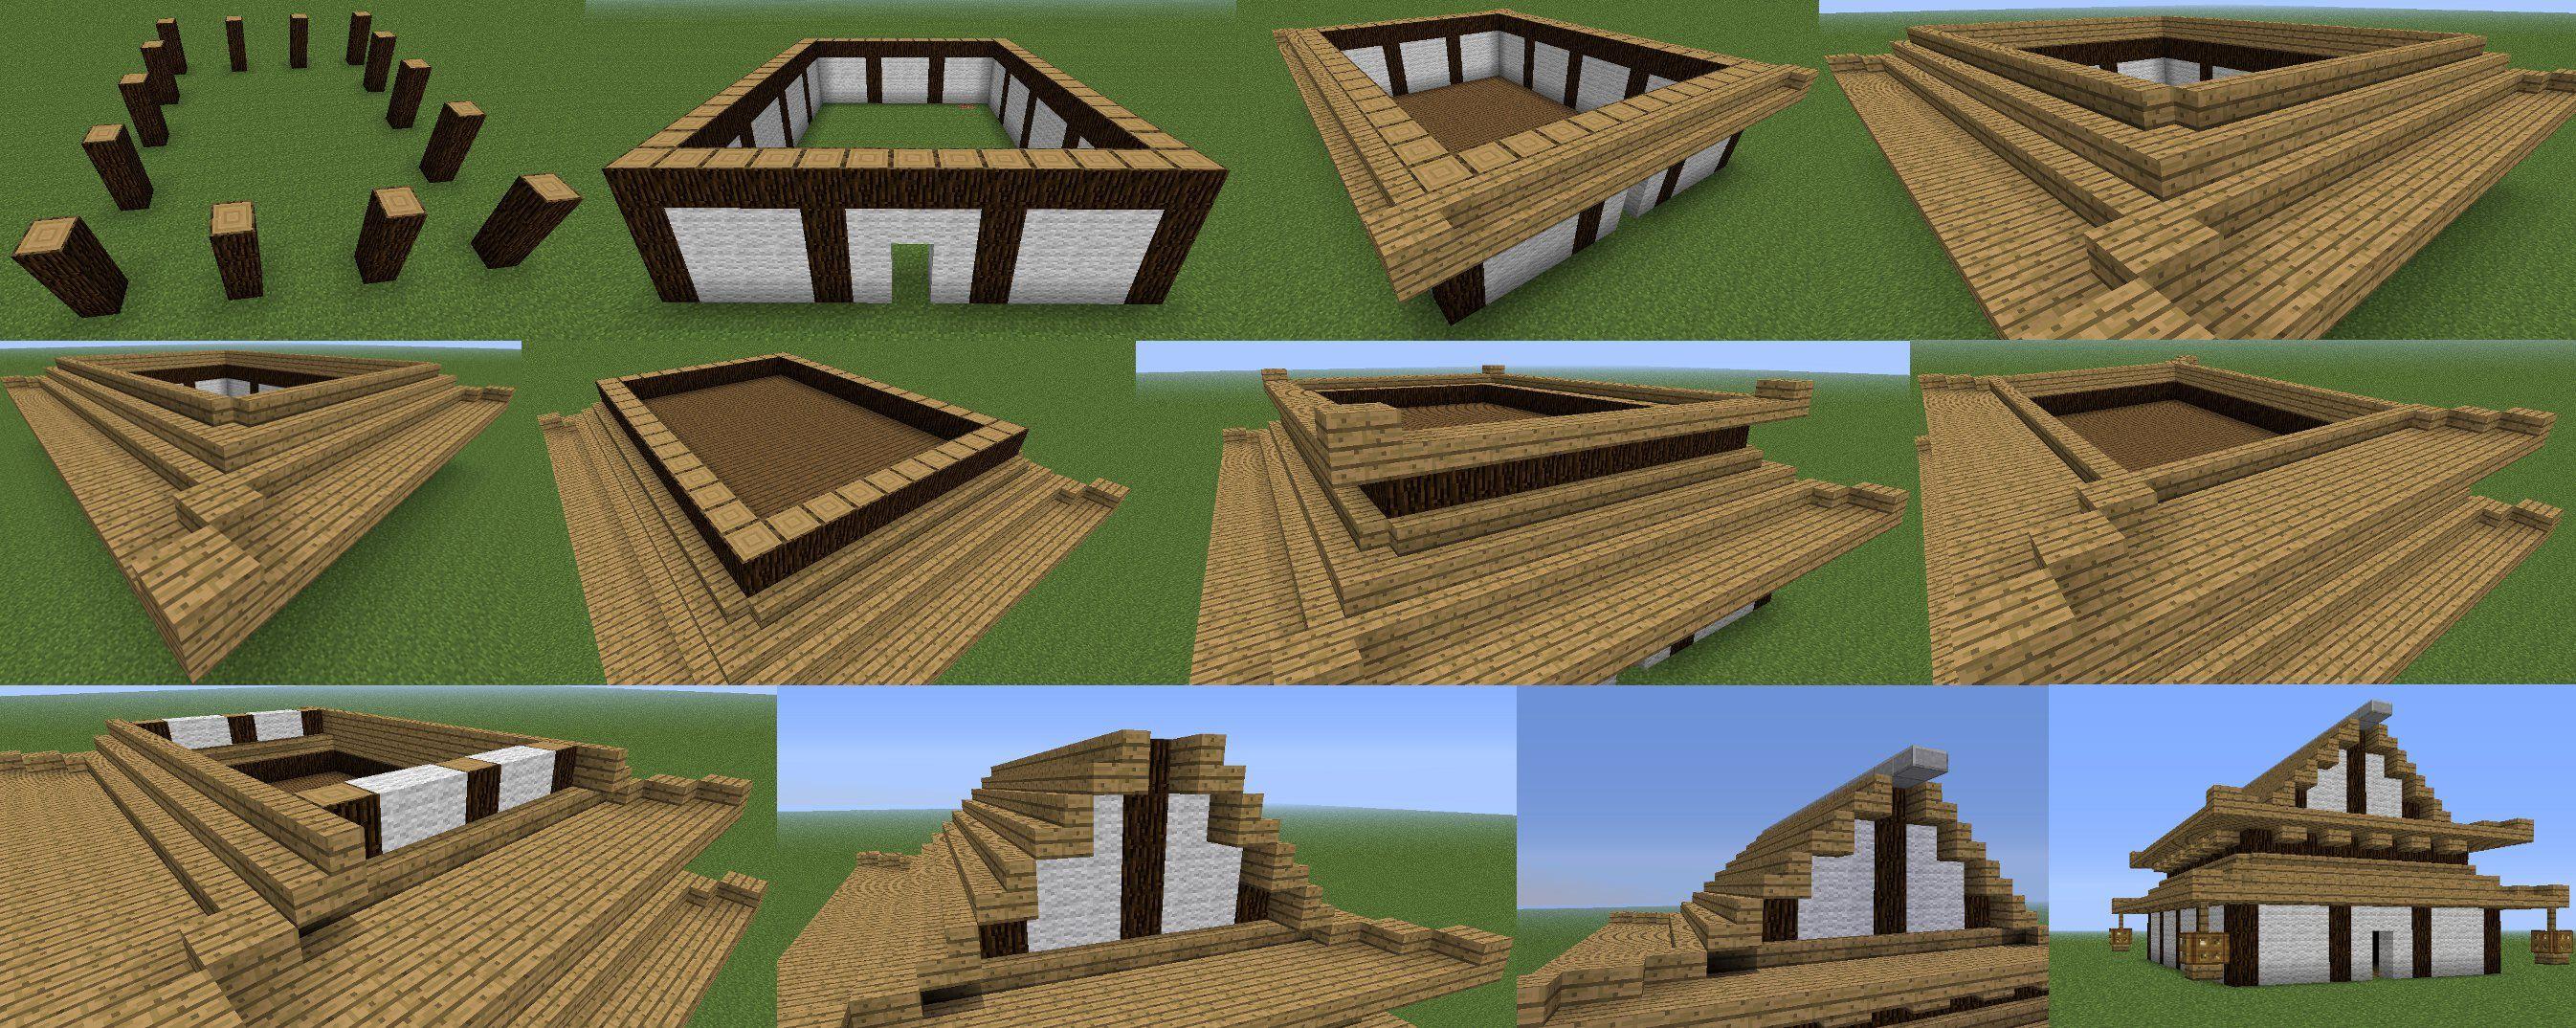 Japanese Building Style In Minecraft Minecraft Guides Minecraft - Minecraft japanische hauser bauen